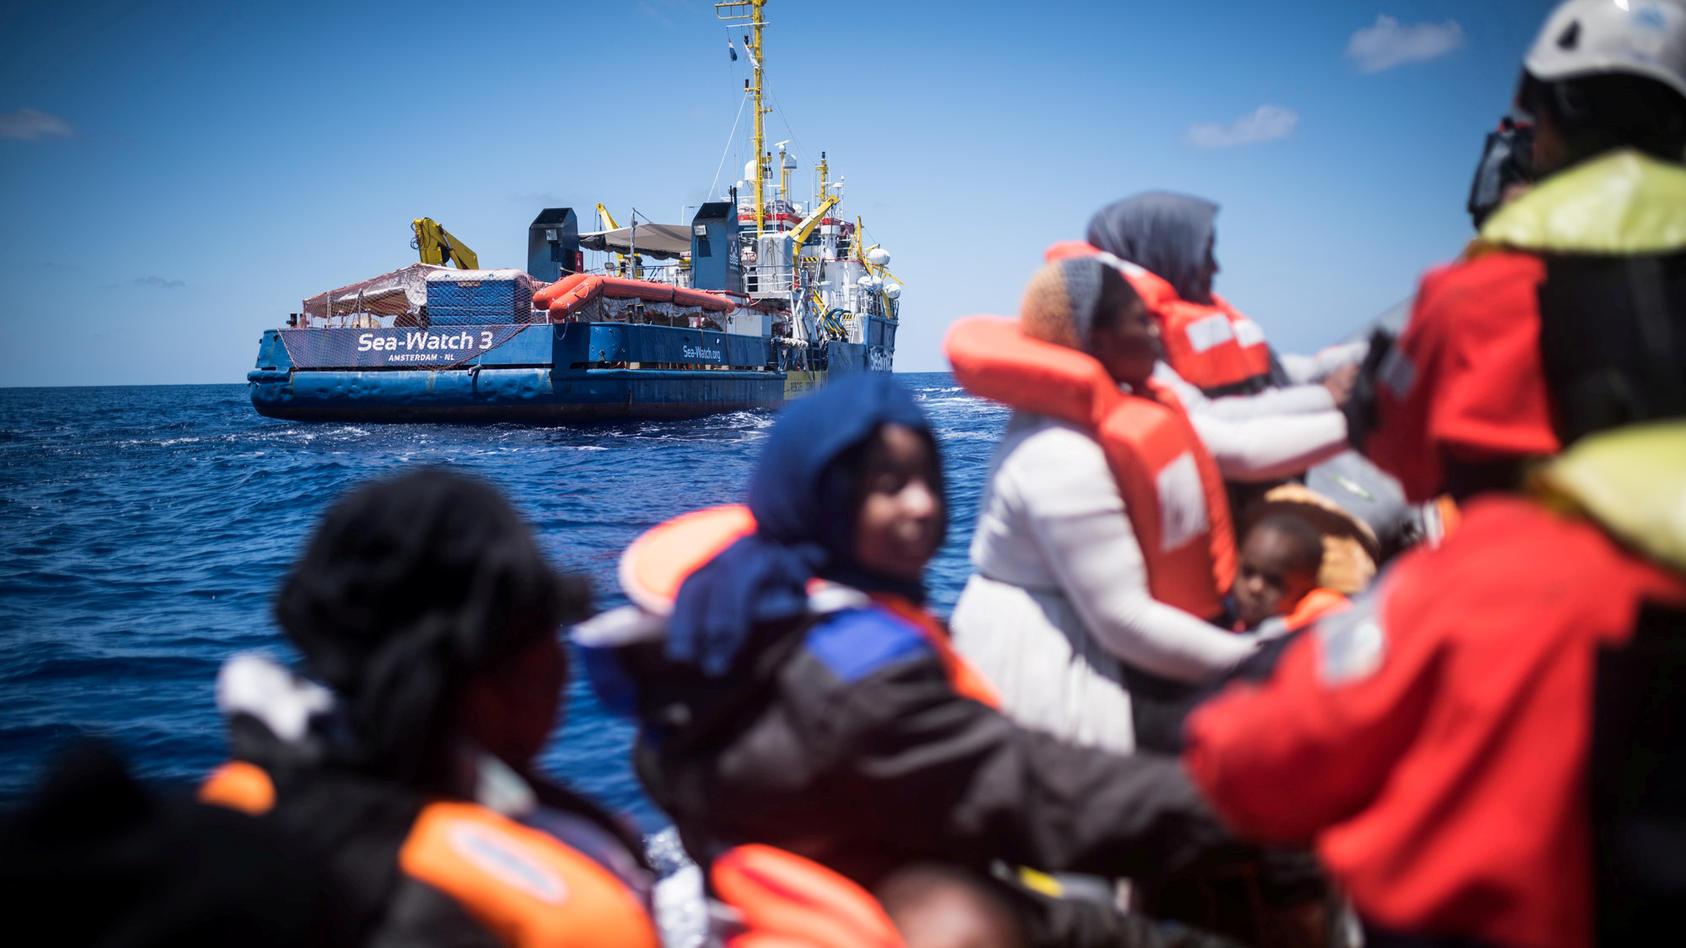 Sea Watch migrant rescue of Lampedusa coast